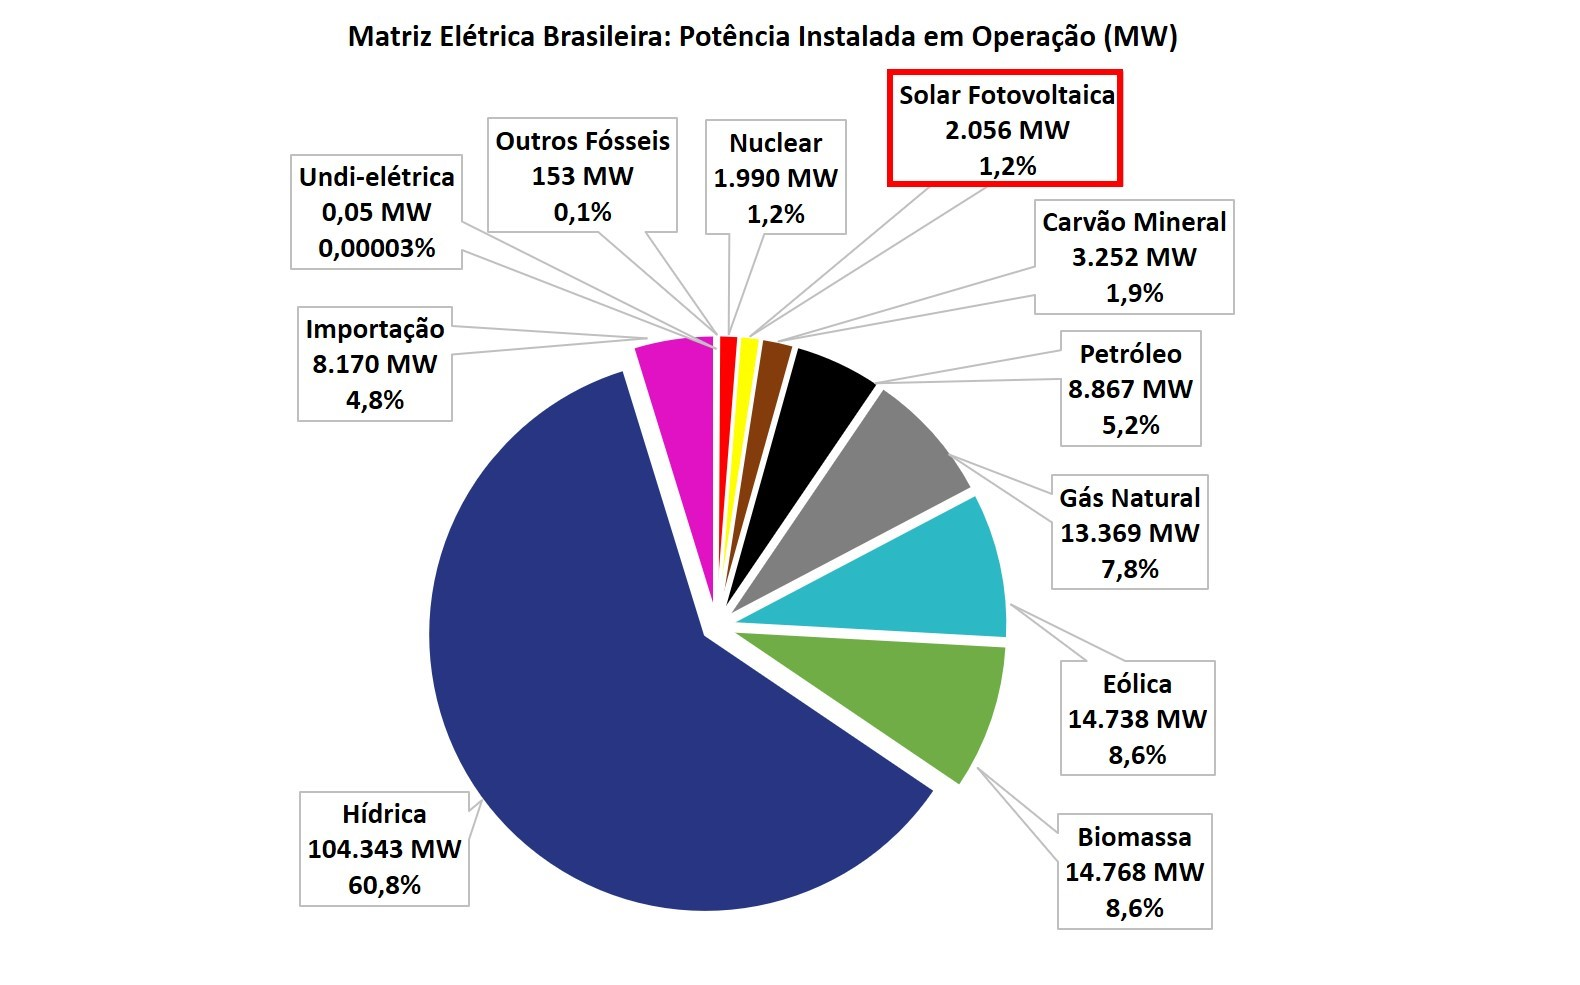 fontes alternativas de energia _ matriz elétrica brasileira